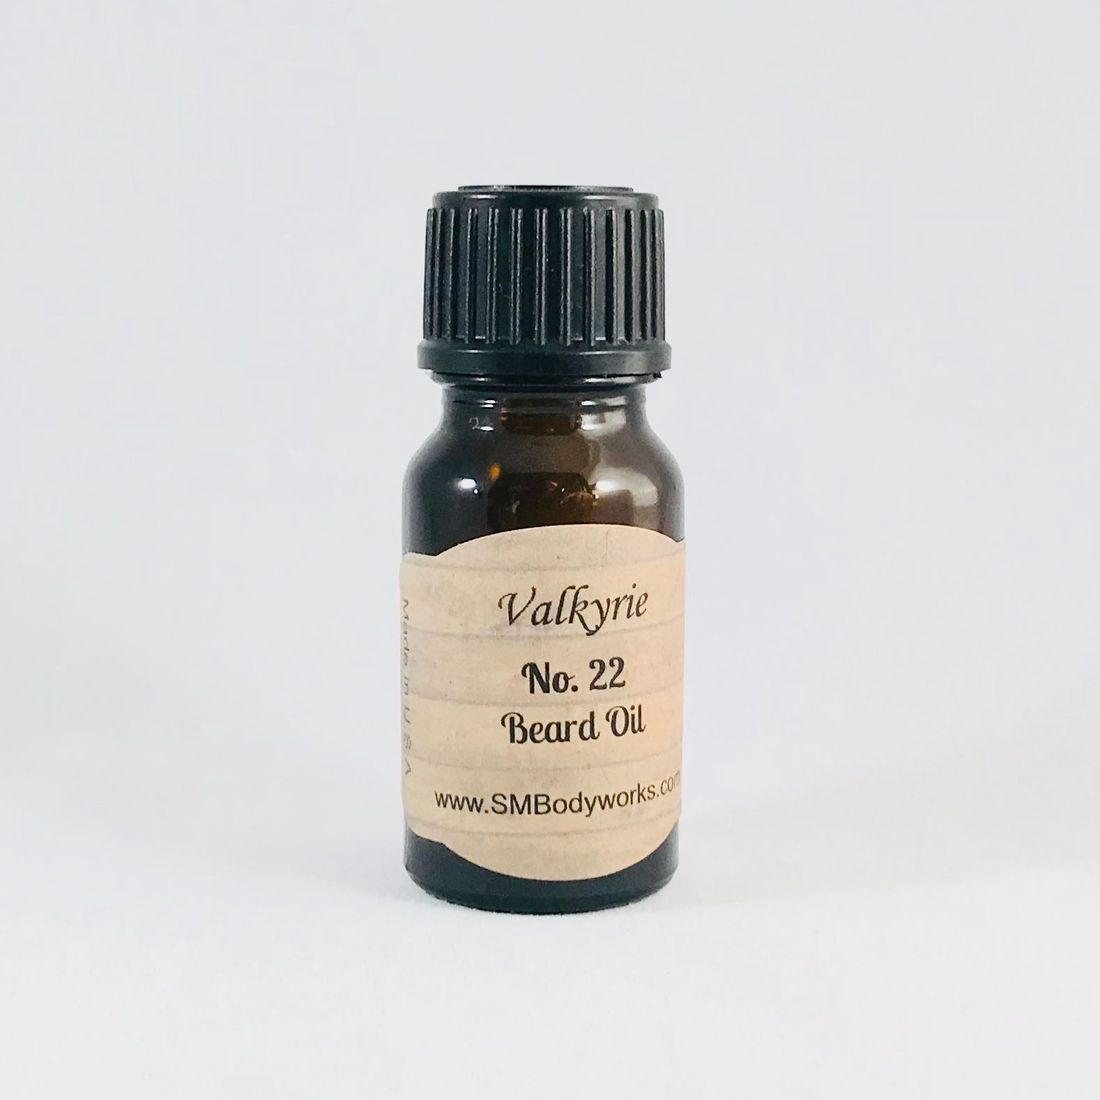 Beard Oil, Sampler, Trial Size, Travel Size, Beard Balm